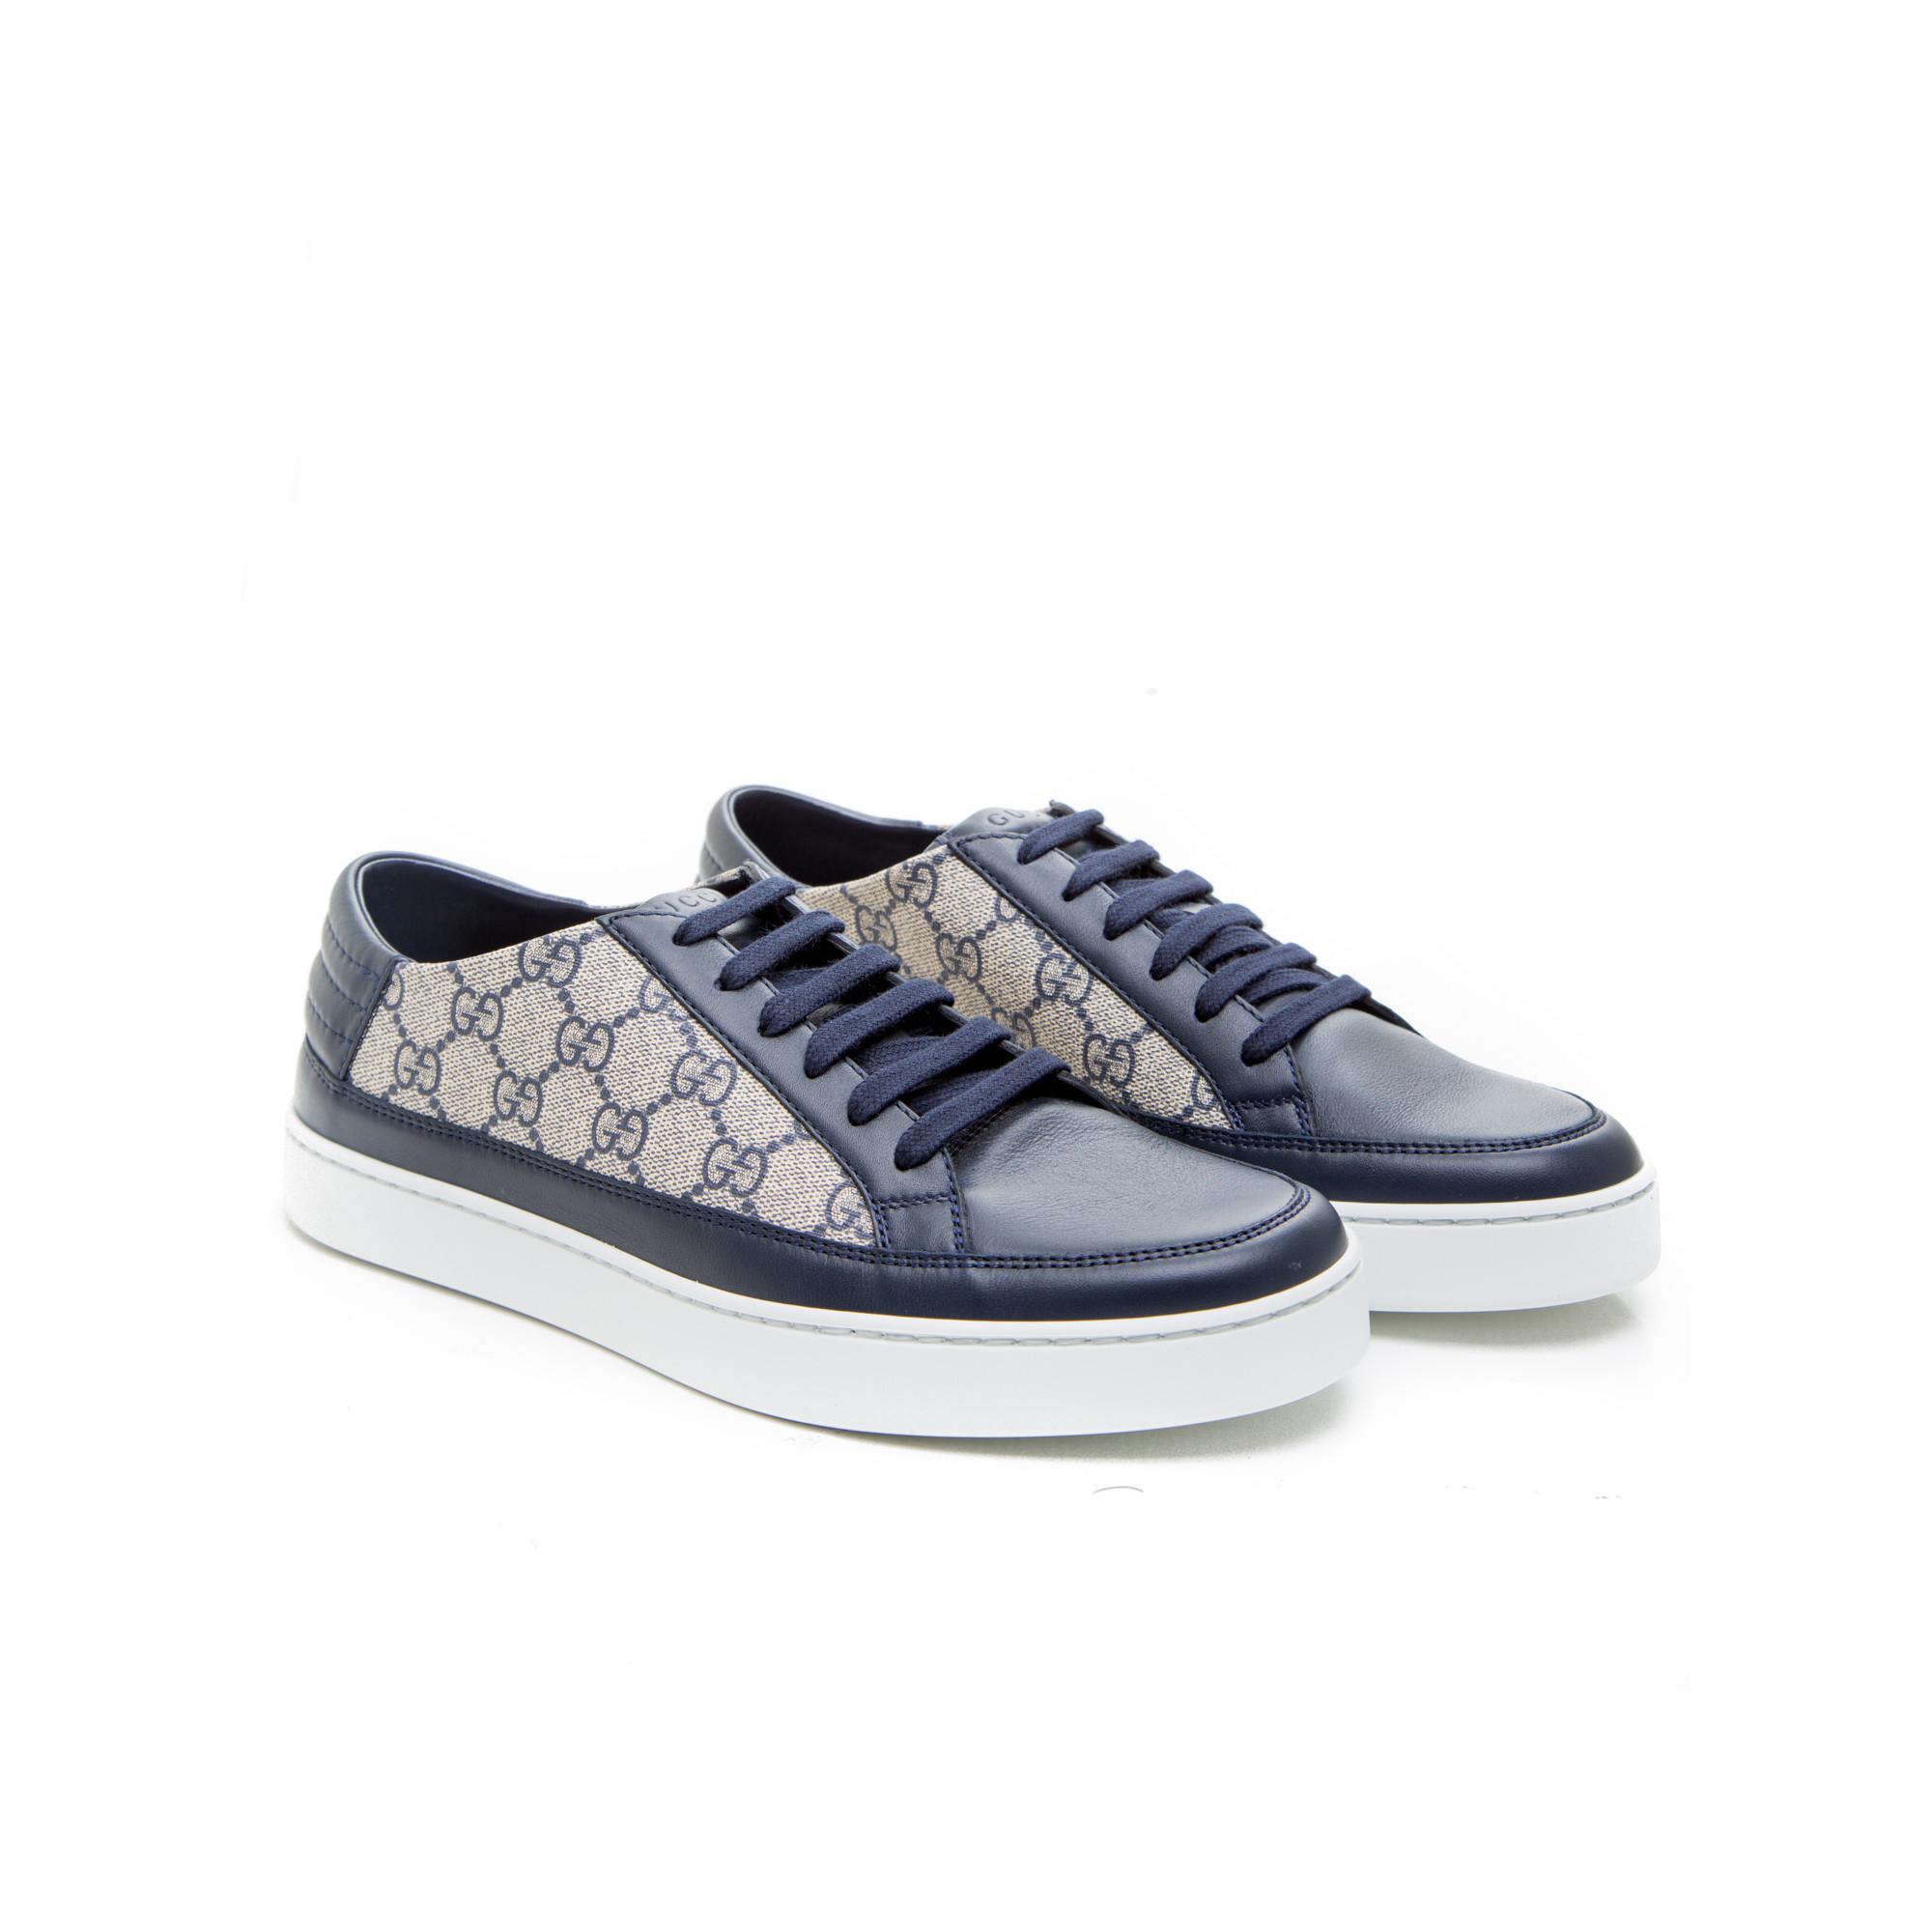 Chaussures Gucci Beige Pour Femmes lghLcBK